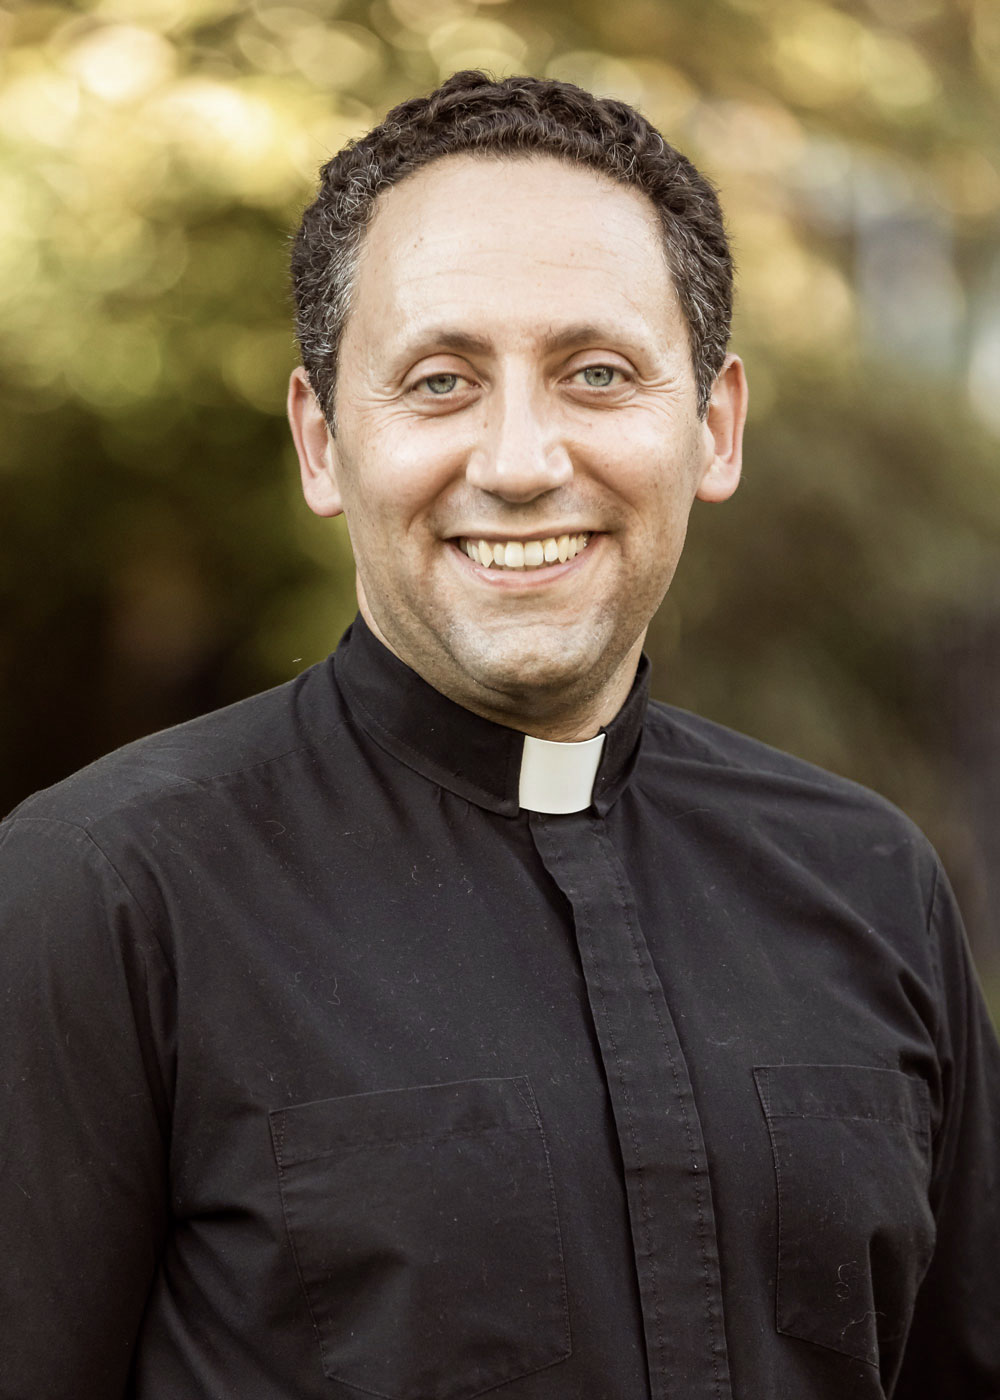 The Reverend Dr. Adam J. Shoemaker